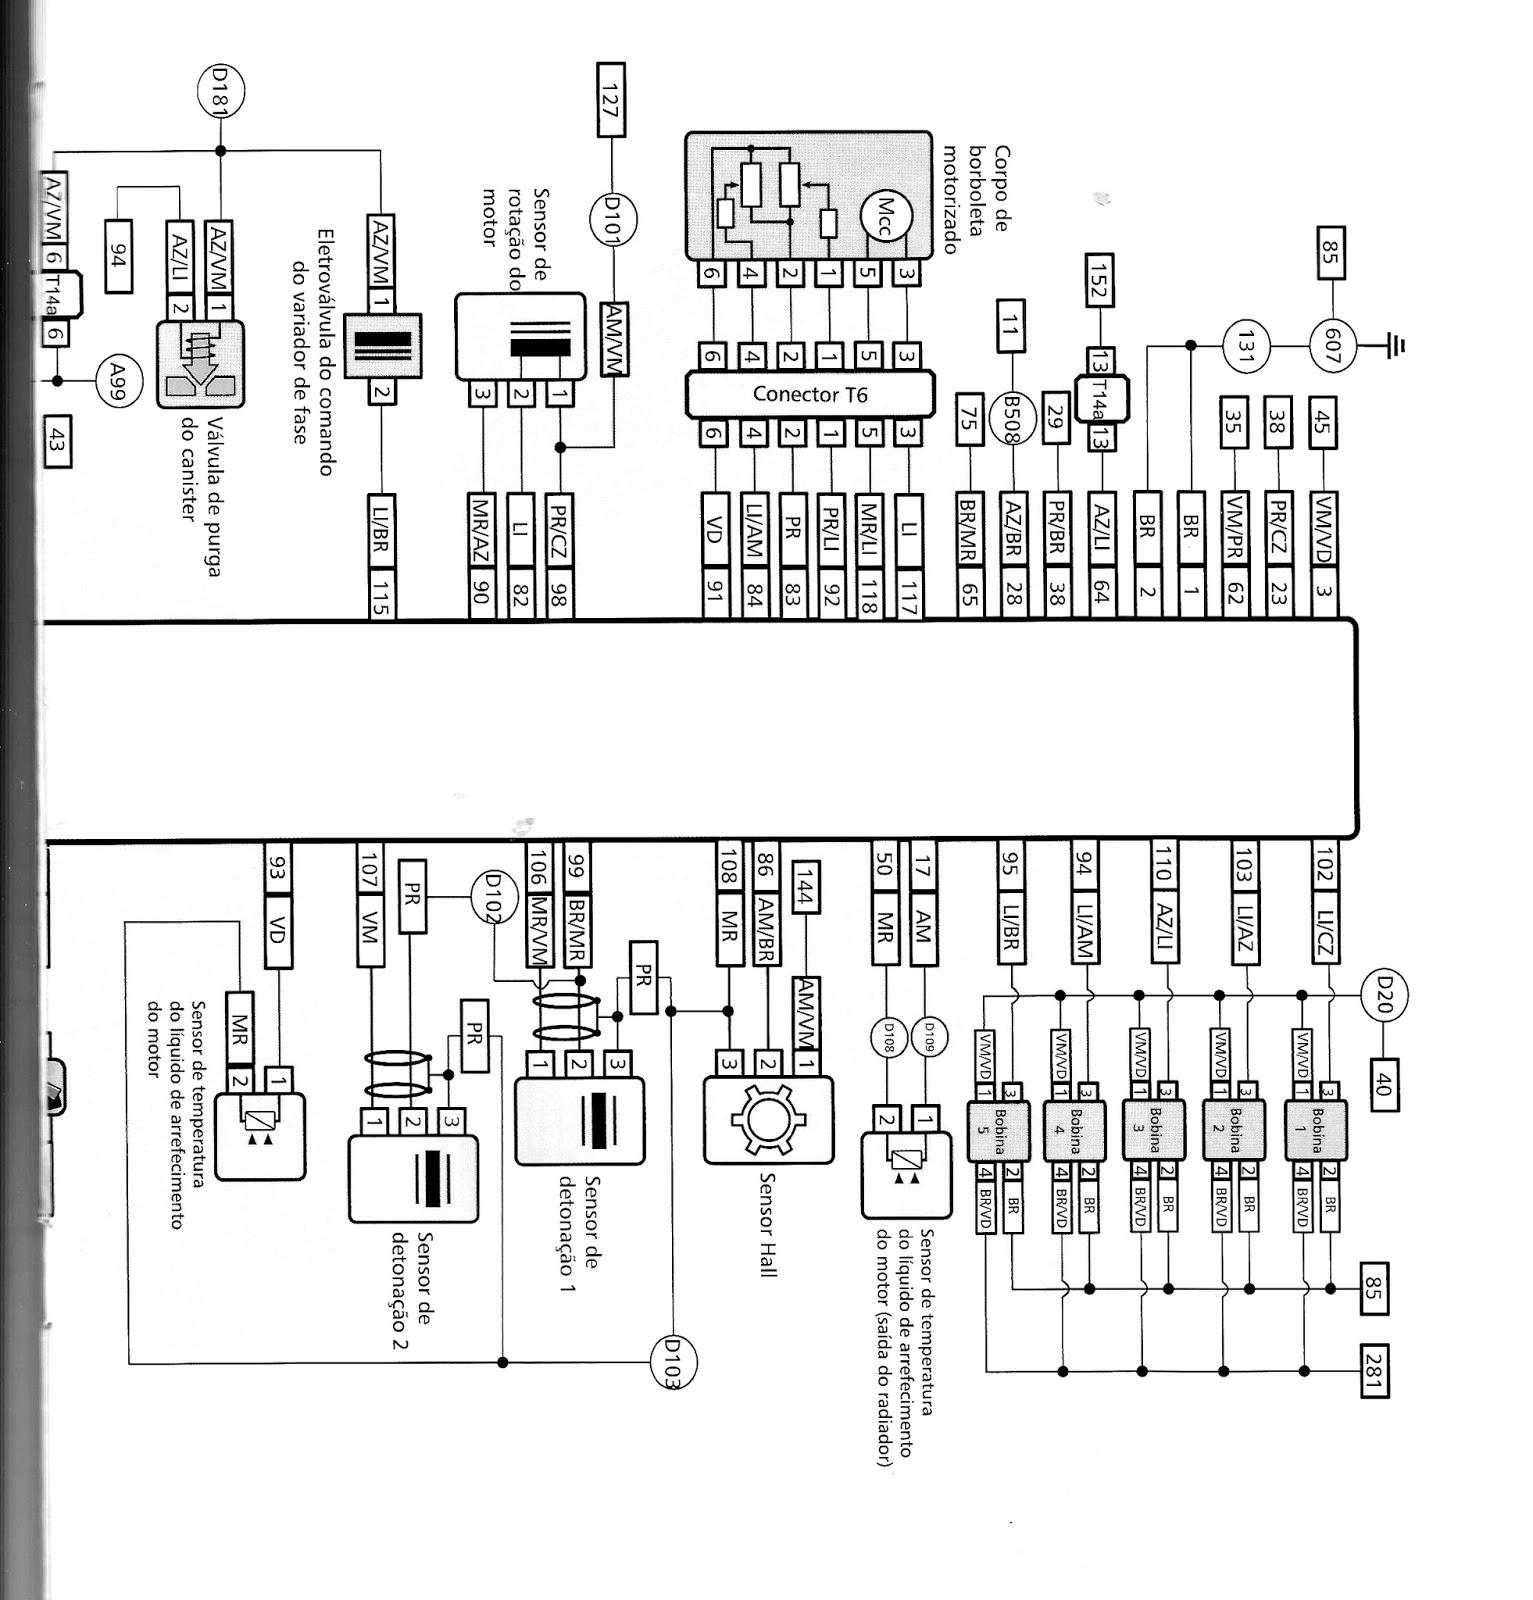 Epaul Garage: Esquema elétrico do VW Jetta 2.5 20V ano